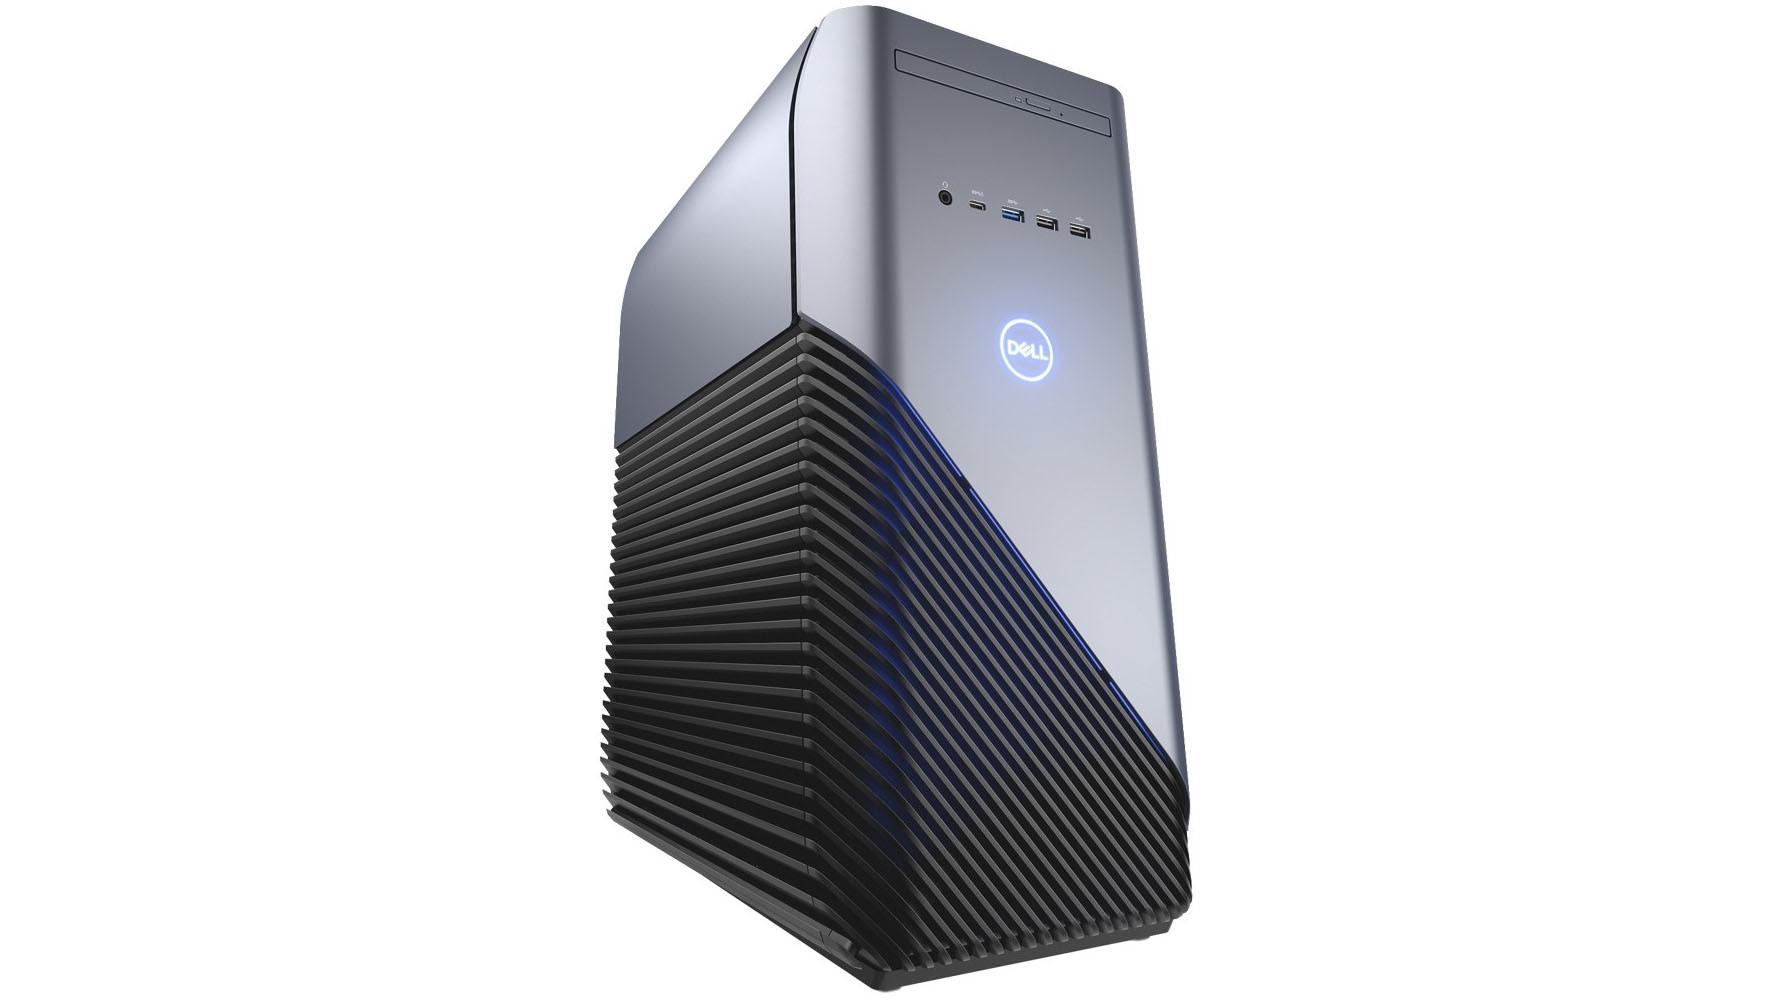 Dell's Inspiron Gaming Desktop 5680 has Intel's hexa-core processors and  more